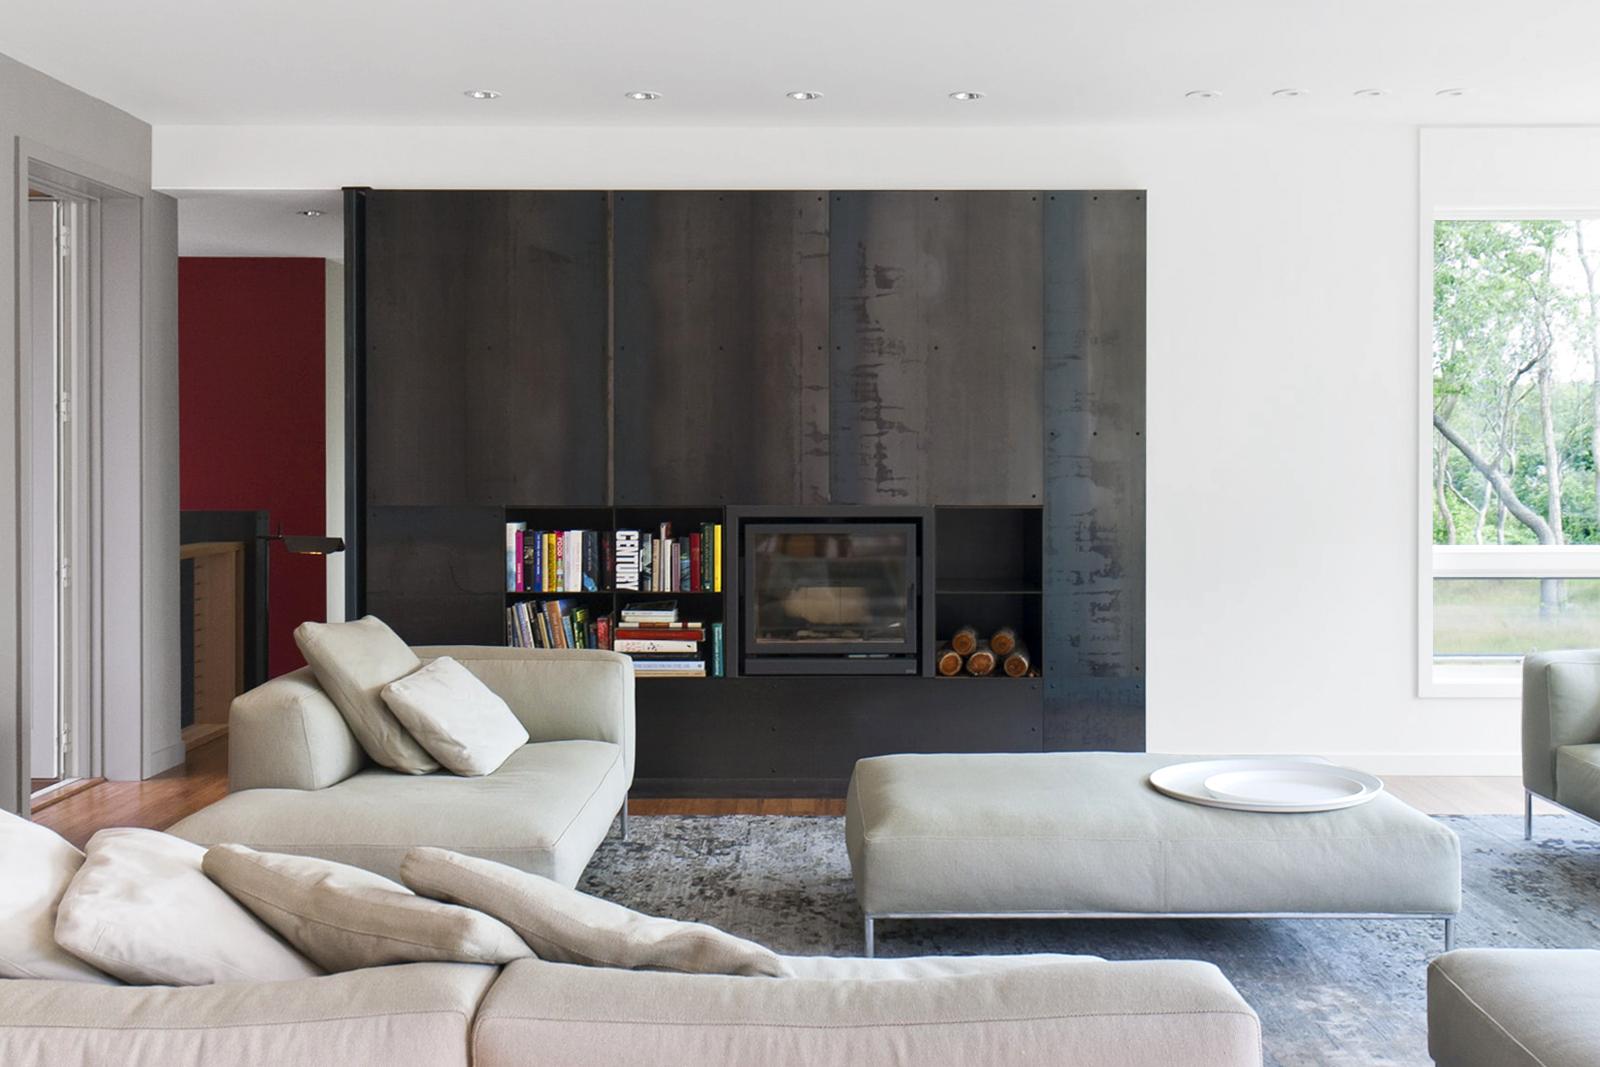 08-res4-resolution-4-architecture-modern-modular-home-prefab-house-fishers-island-interior-living-room.jpg